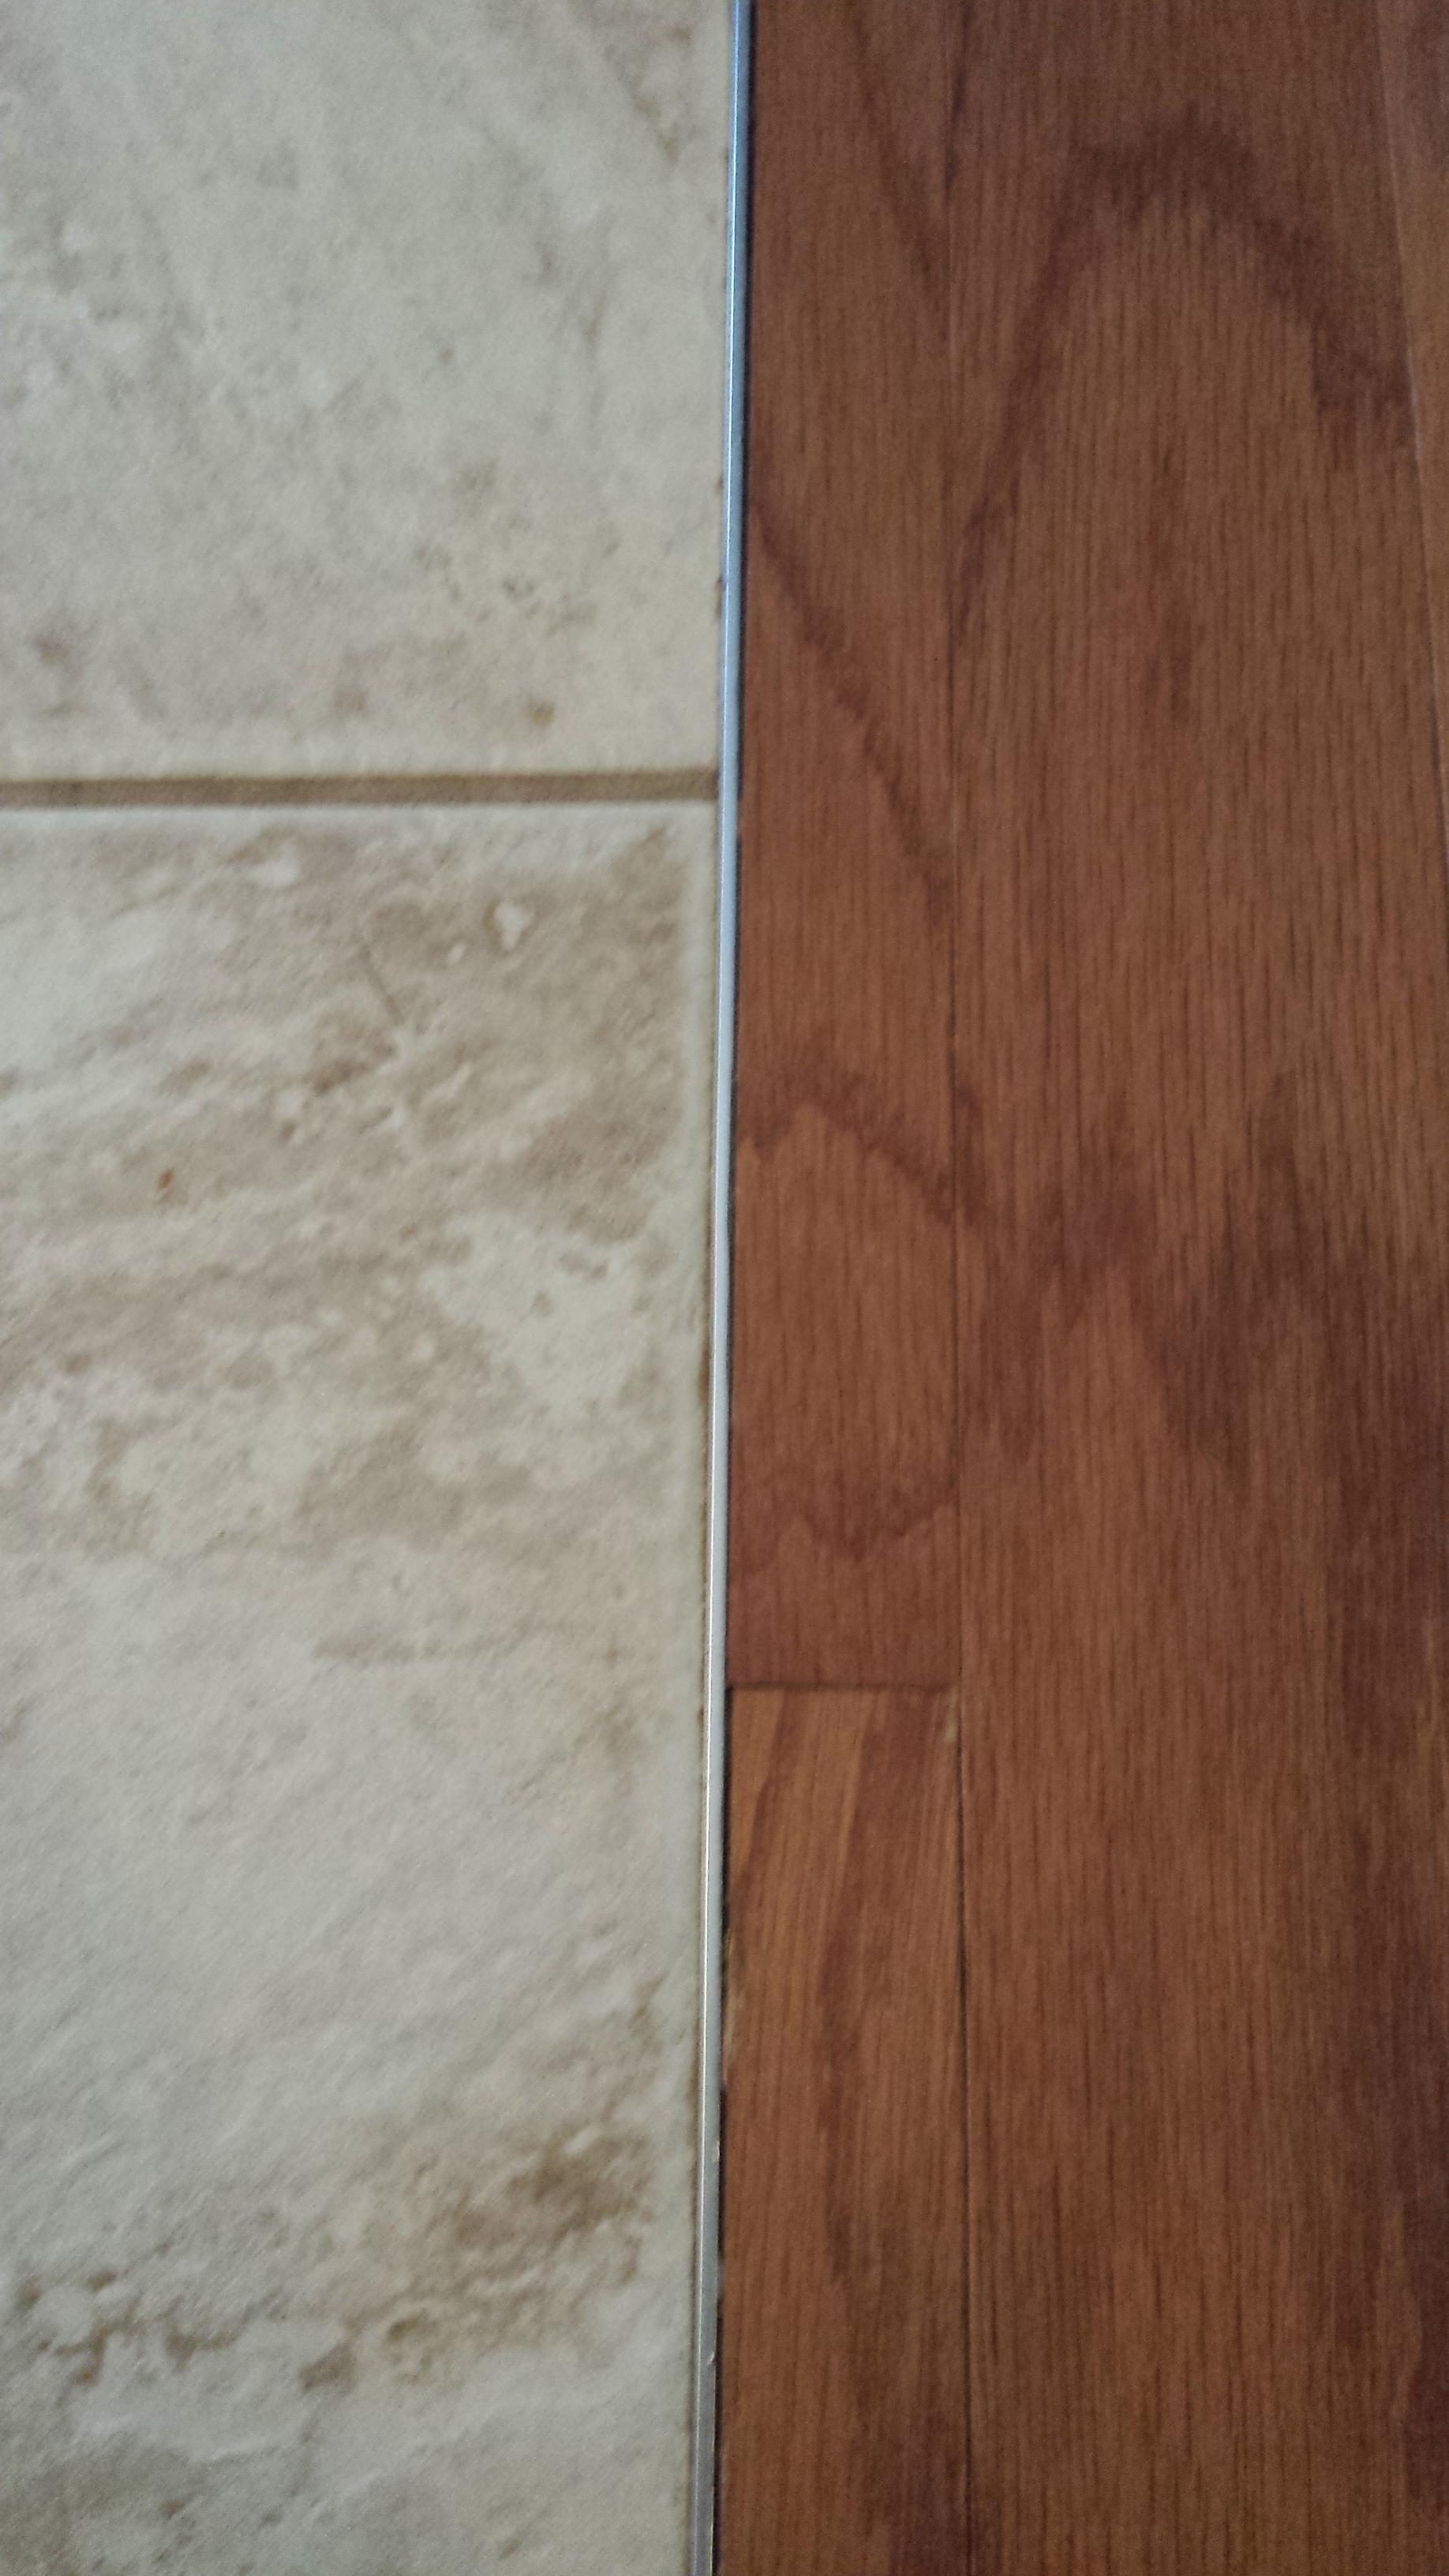 Floating Hardwood Floor Transition To Tile Floating Hardwood Floor Wood Laminate Flooring Modern Wood Floors